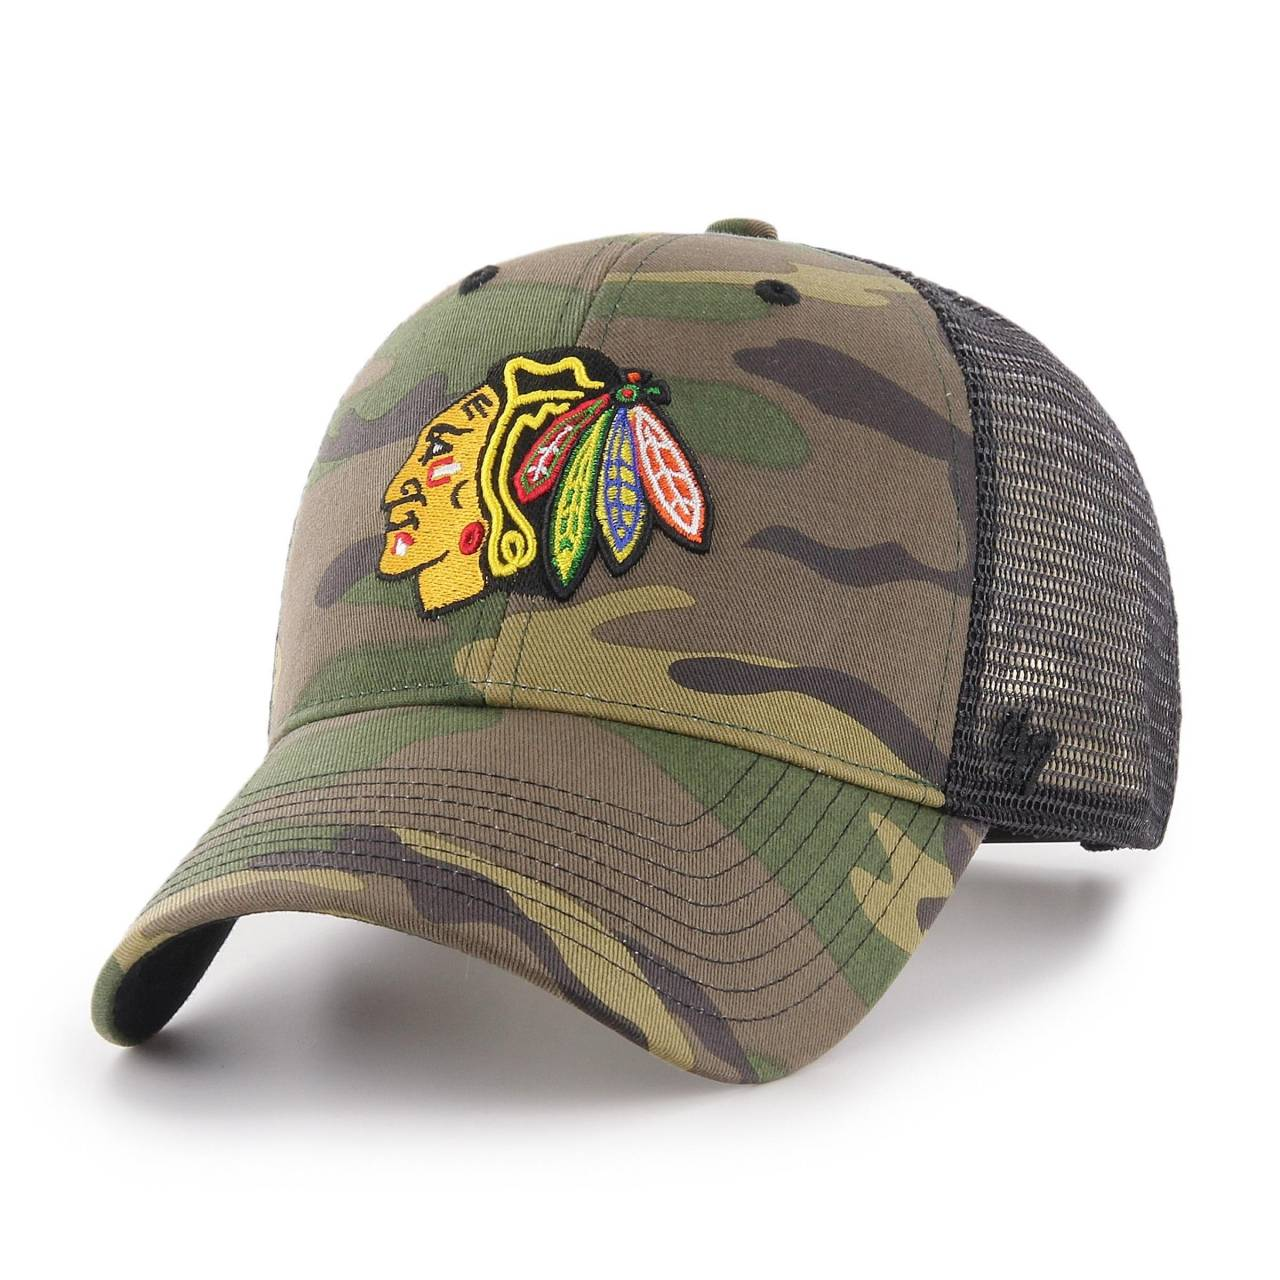 NHL CHICAGO BLACKHAWKS CAMO BRANSON '47 MVP CAP